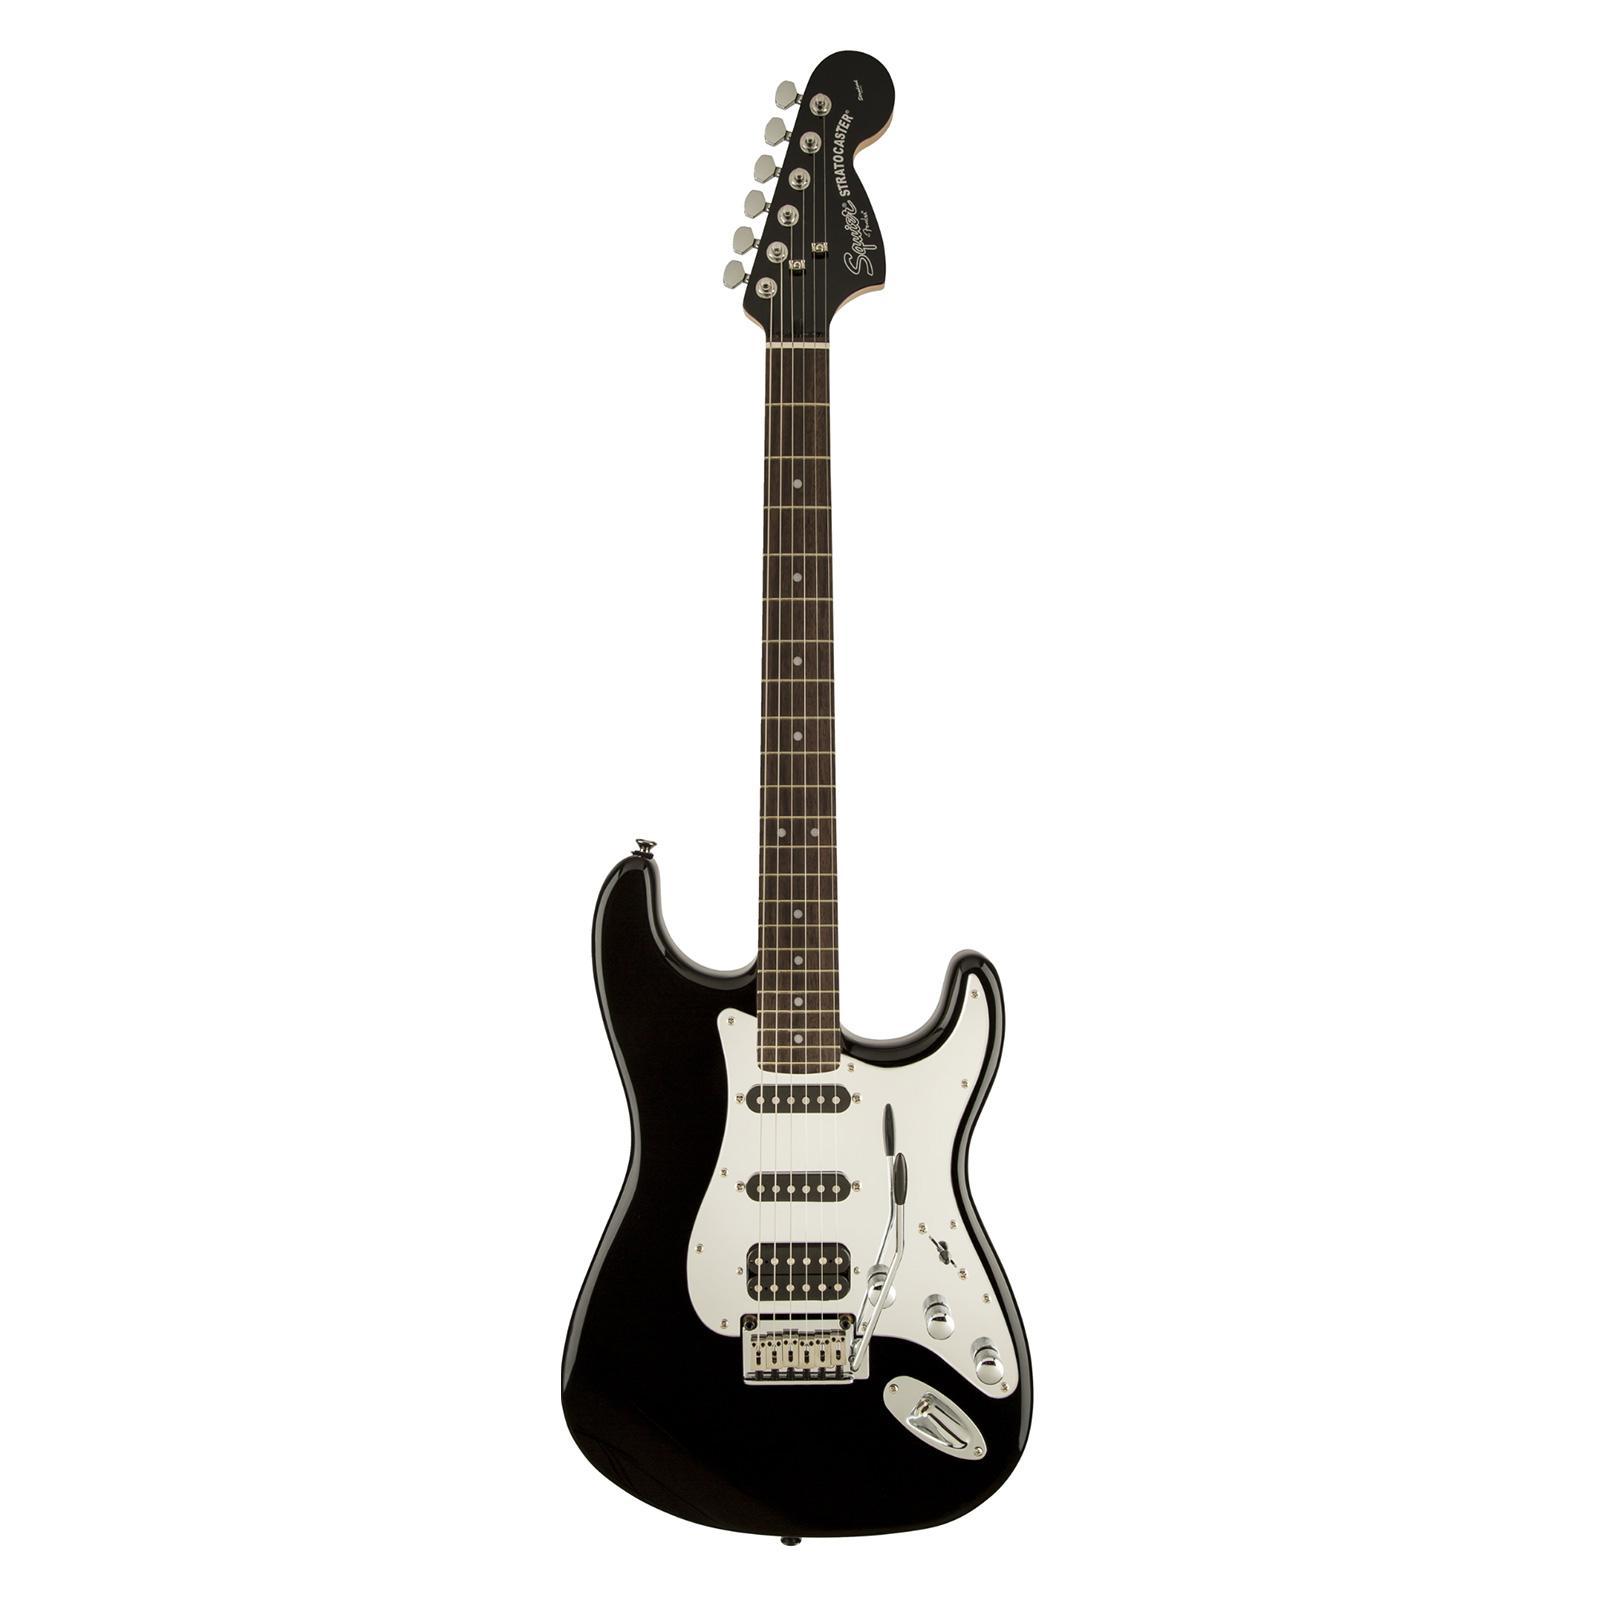 Fender - Guitare Stratocaster Black and Chrome  HSS - noir